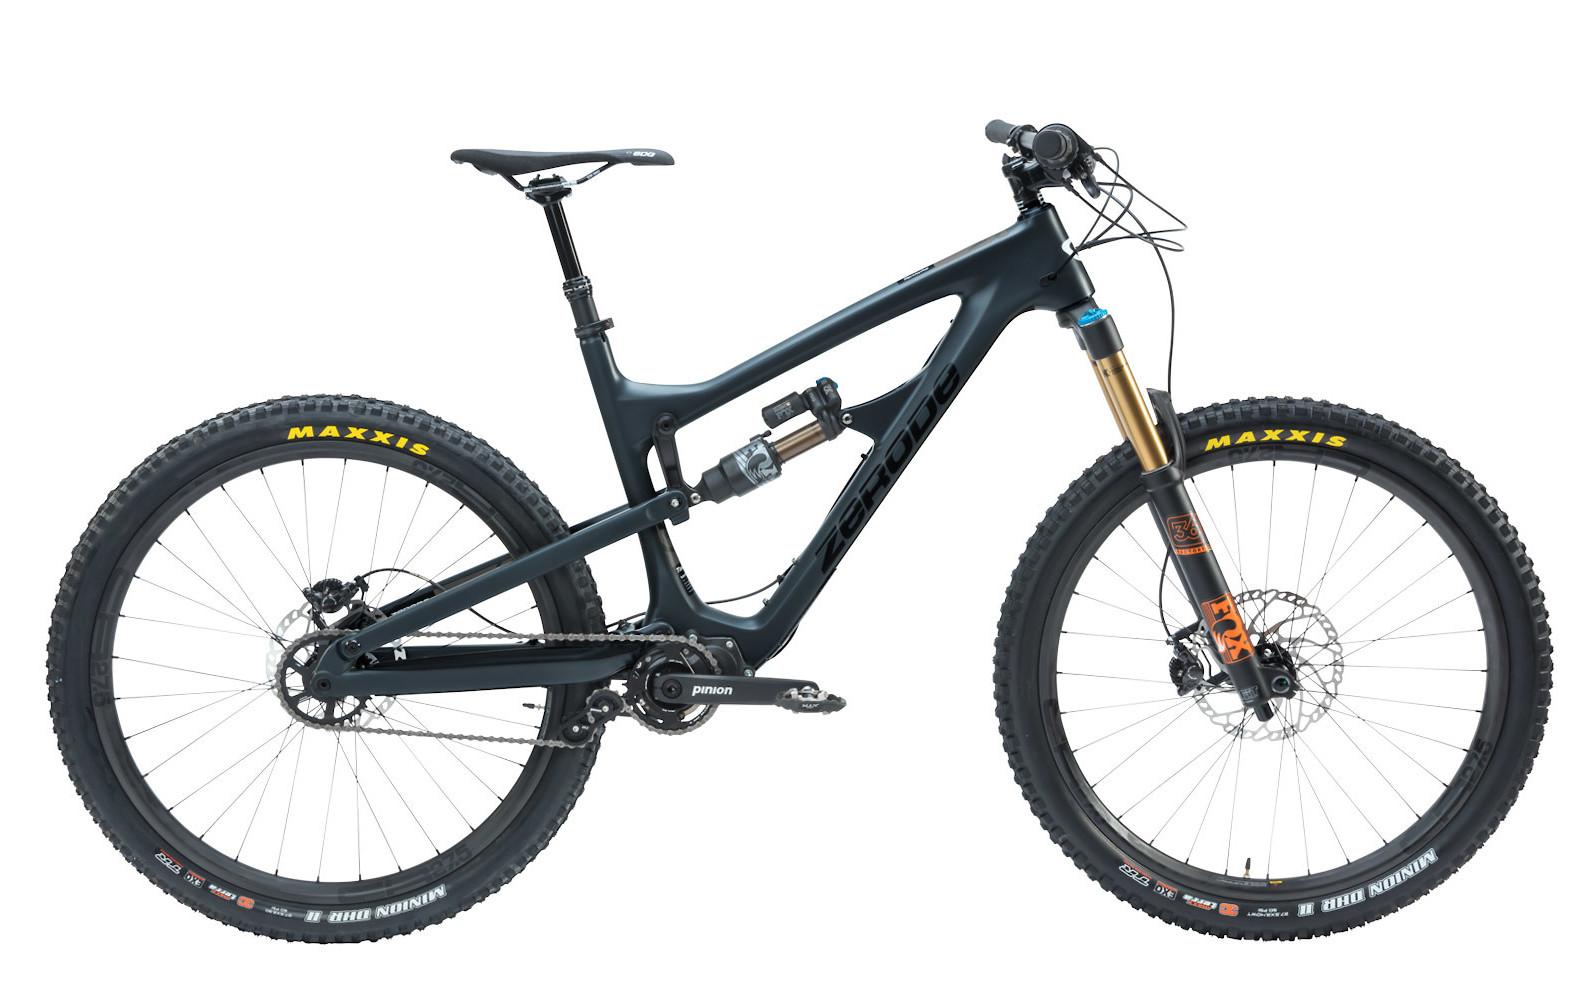 2019 Zerode Taniwha Trail Signature Build Bike